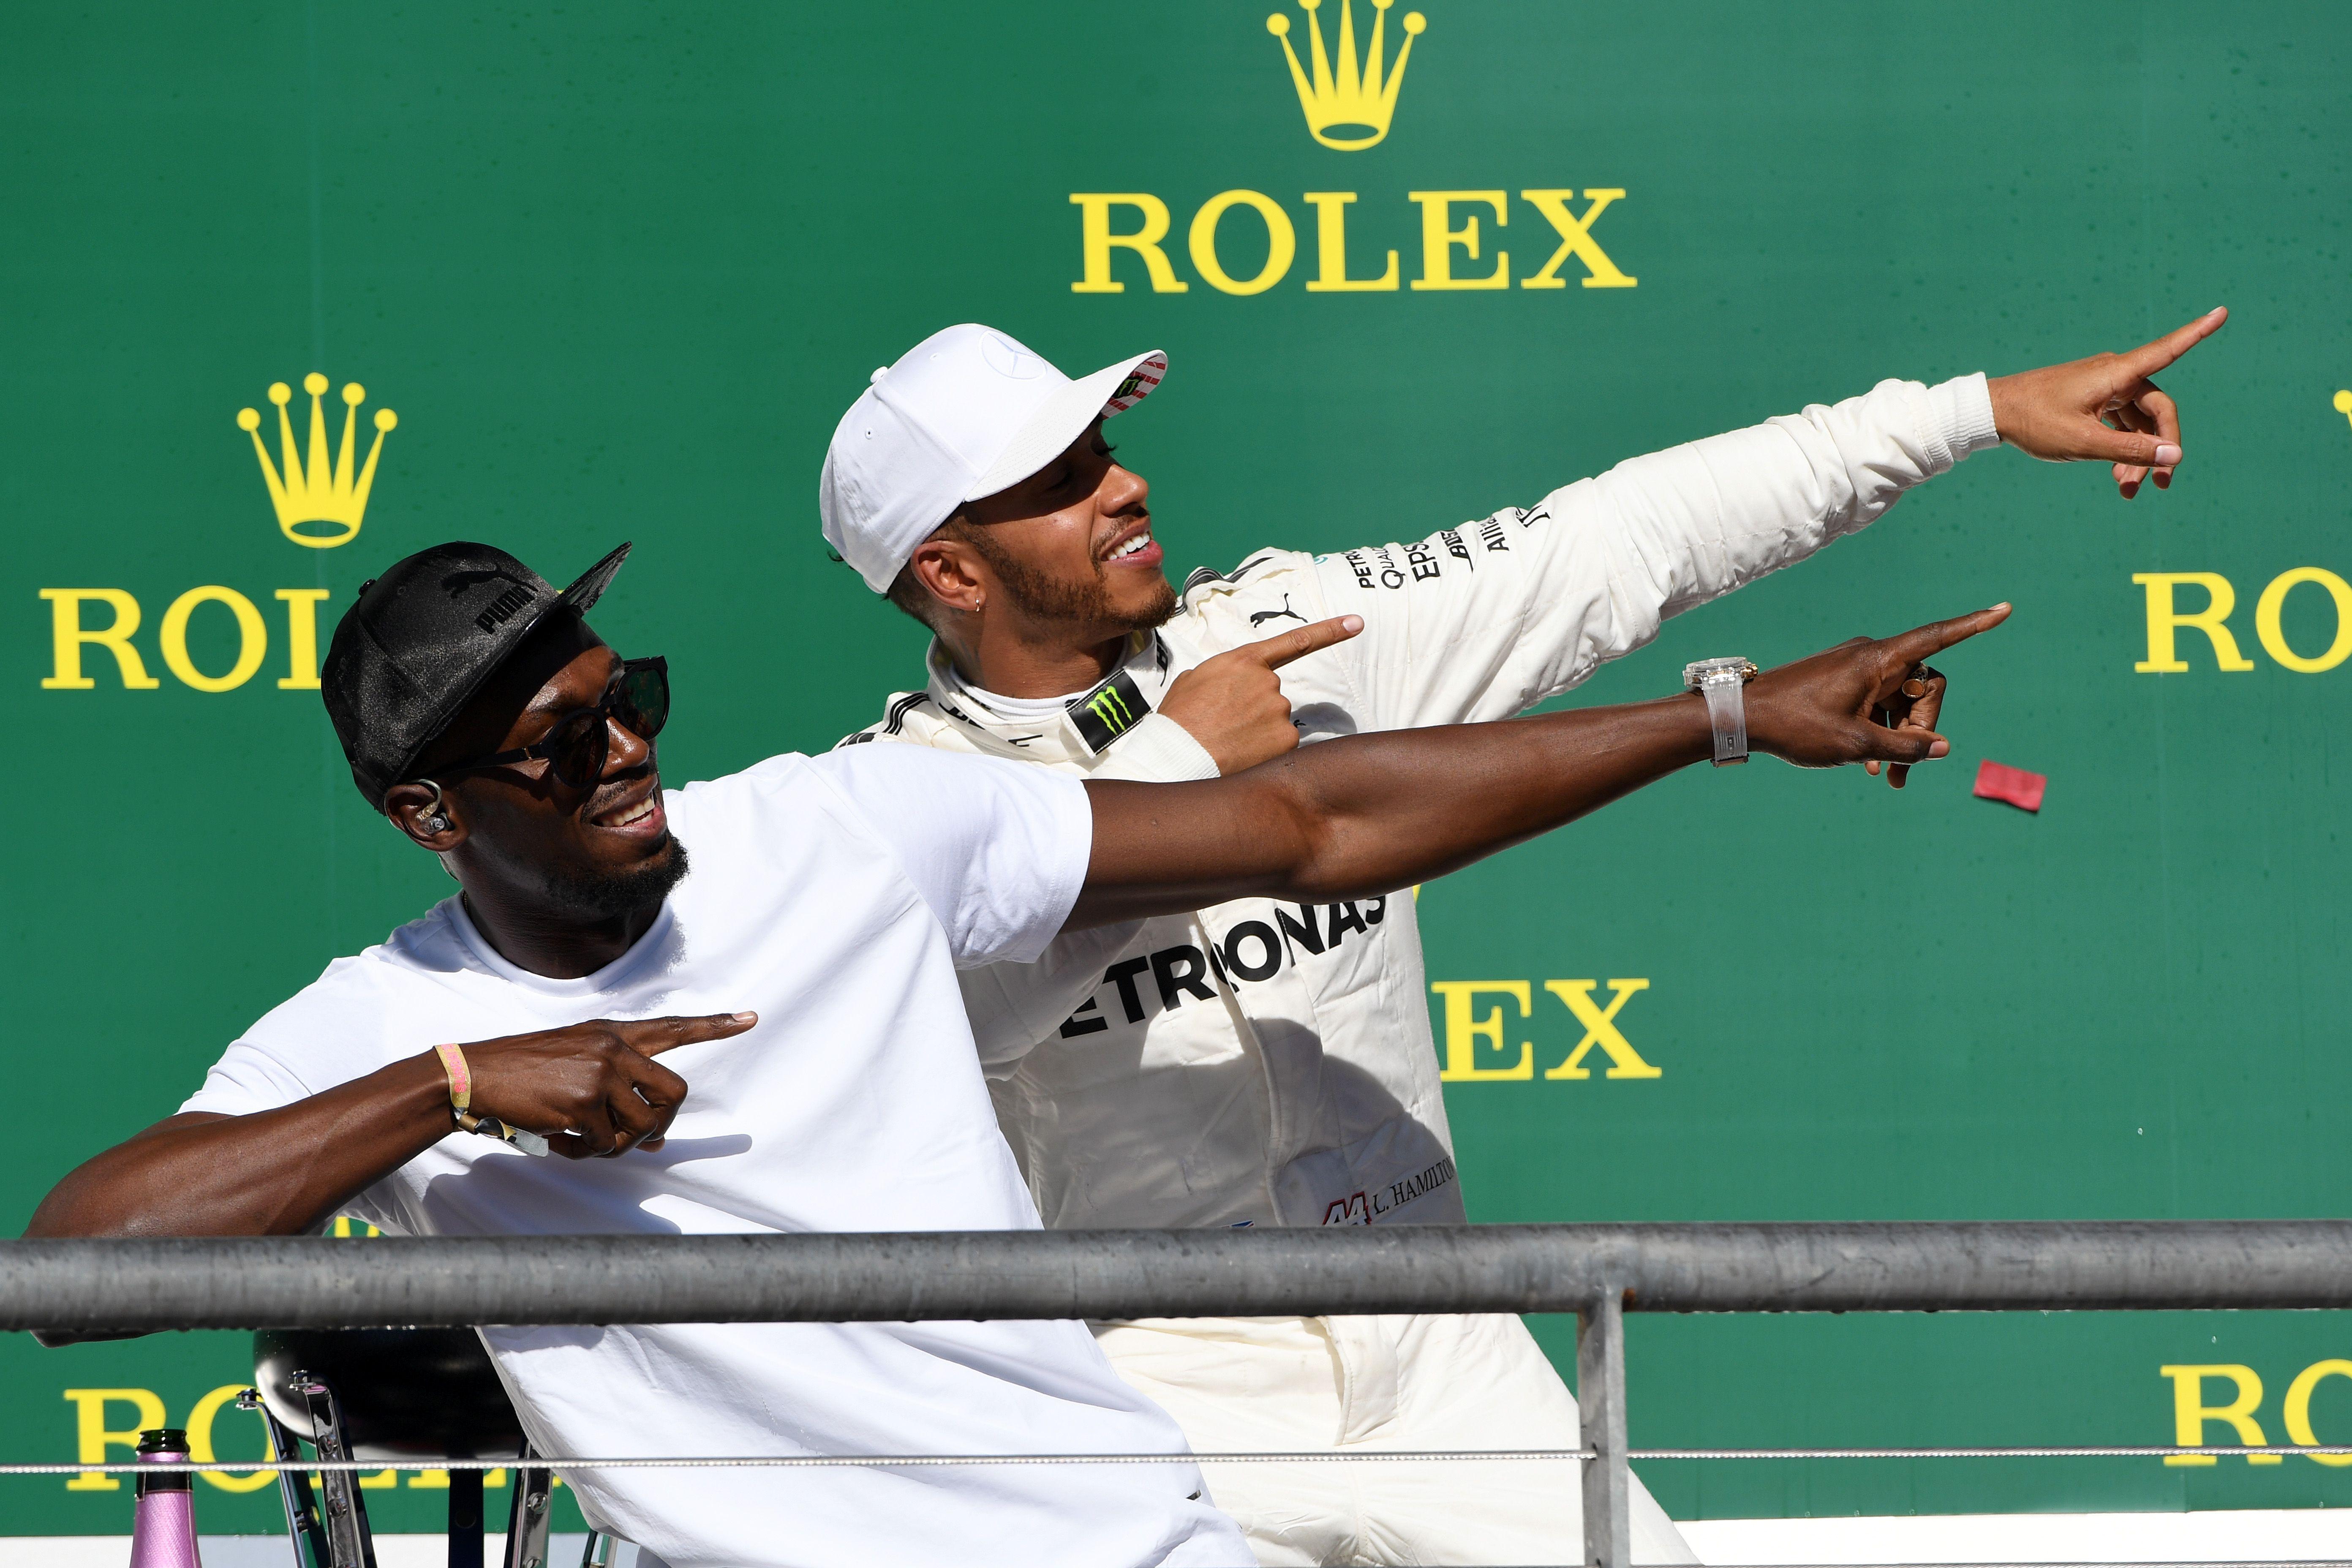 Neymar, Bolt, Tsonga : les 10 images fortes du week-end